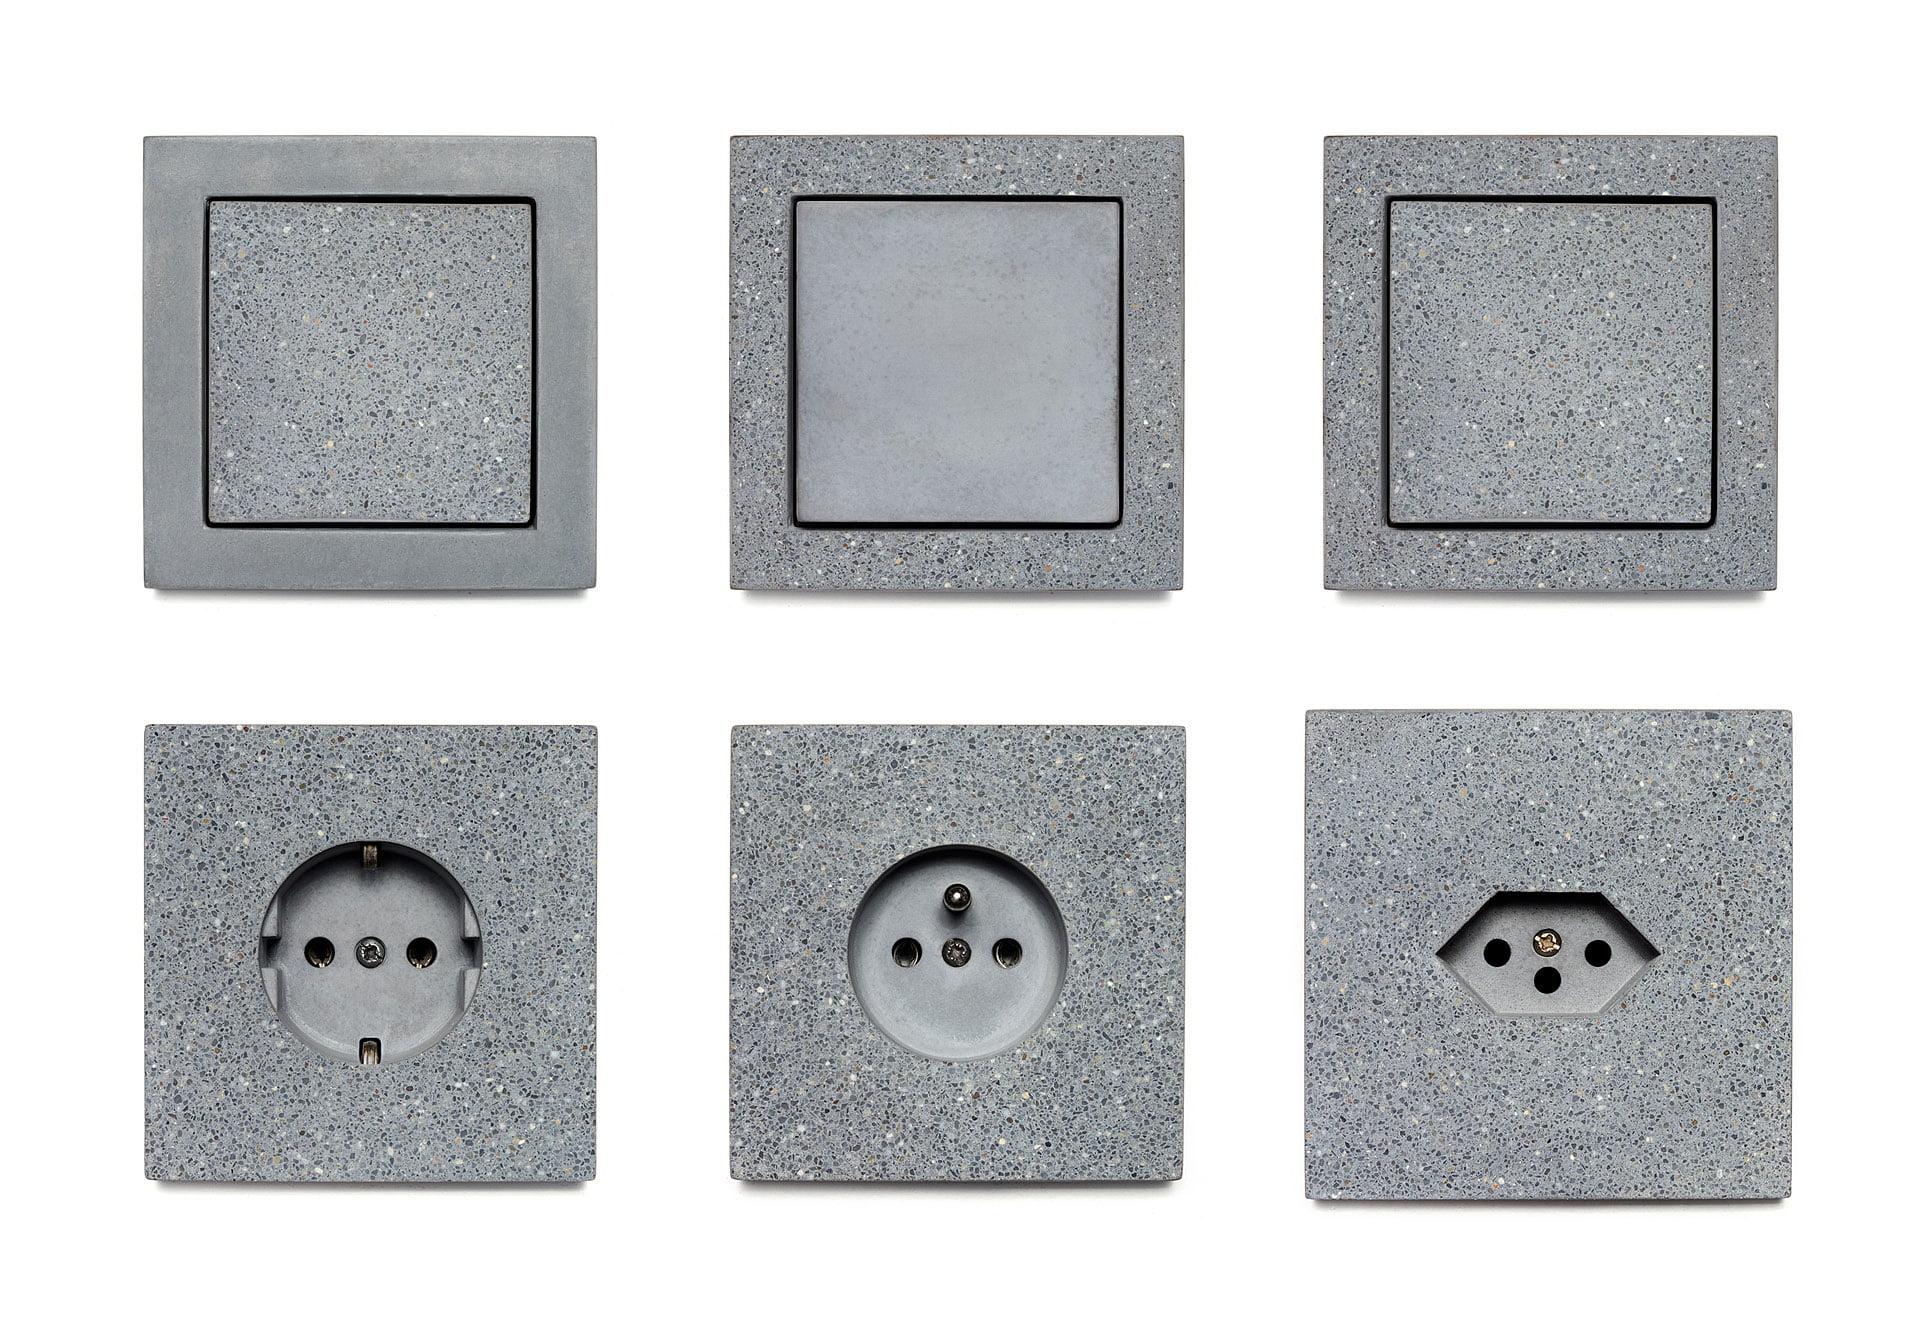 Arkitekttegnet-Beton-stikkontakter-04